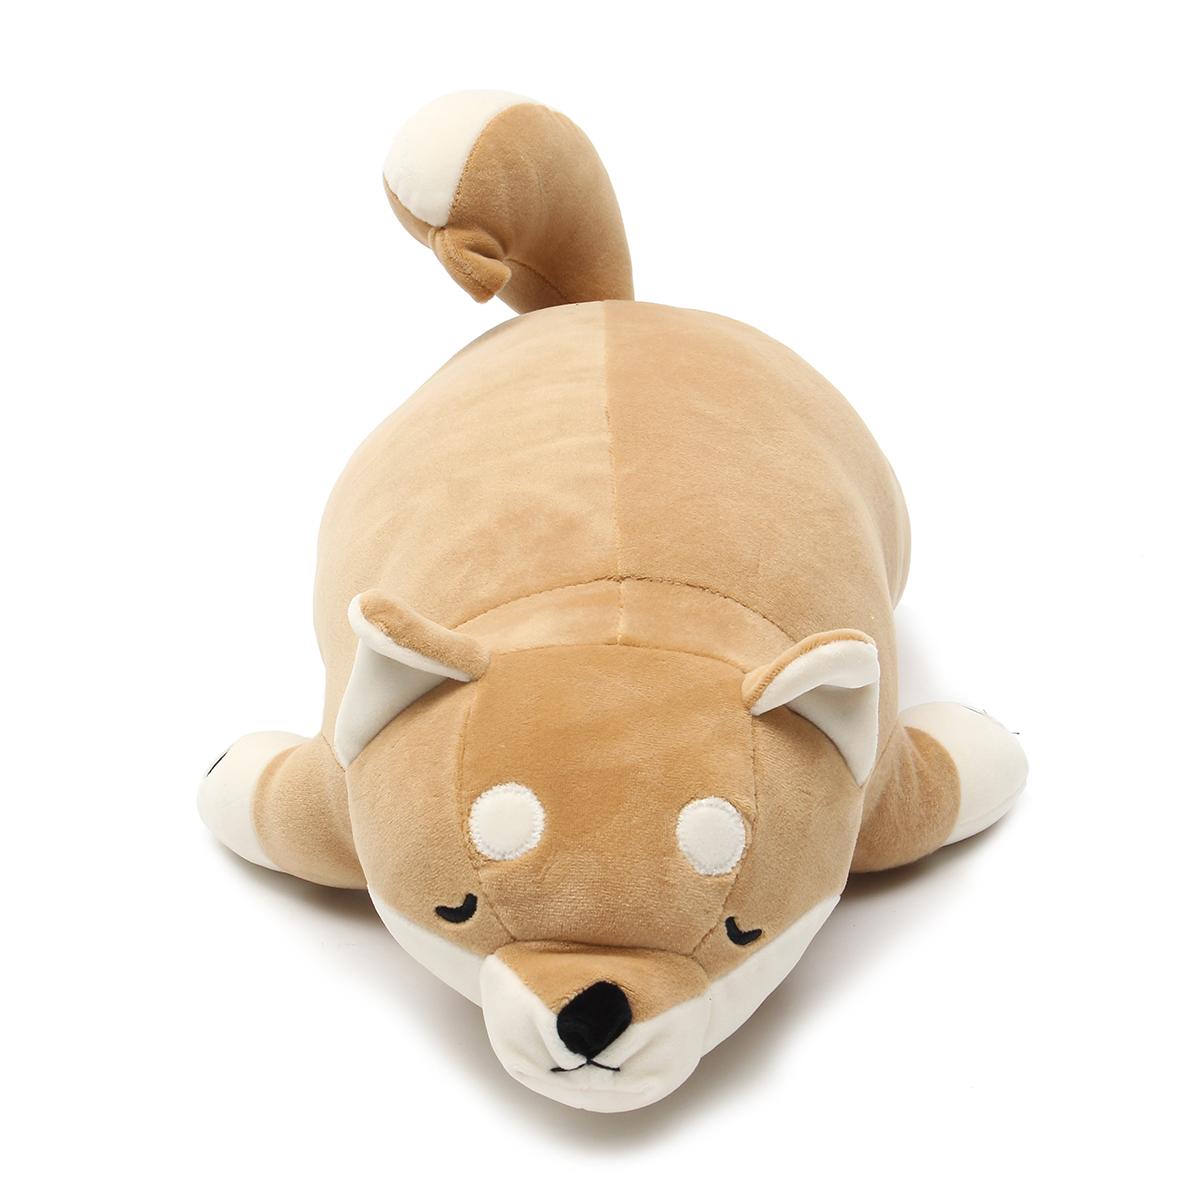 50cm Japanese Anime Shiba Inu Dog Stuffed Plush Toy Doll Soft Stuffed Animal Toy Cute Gift